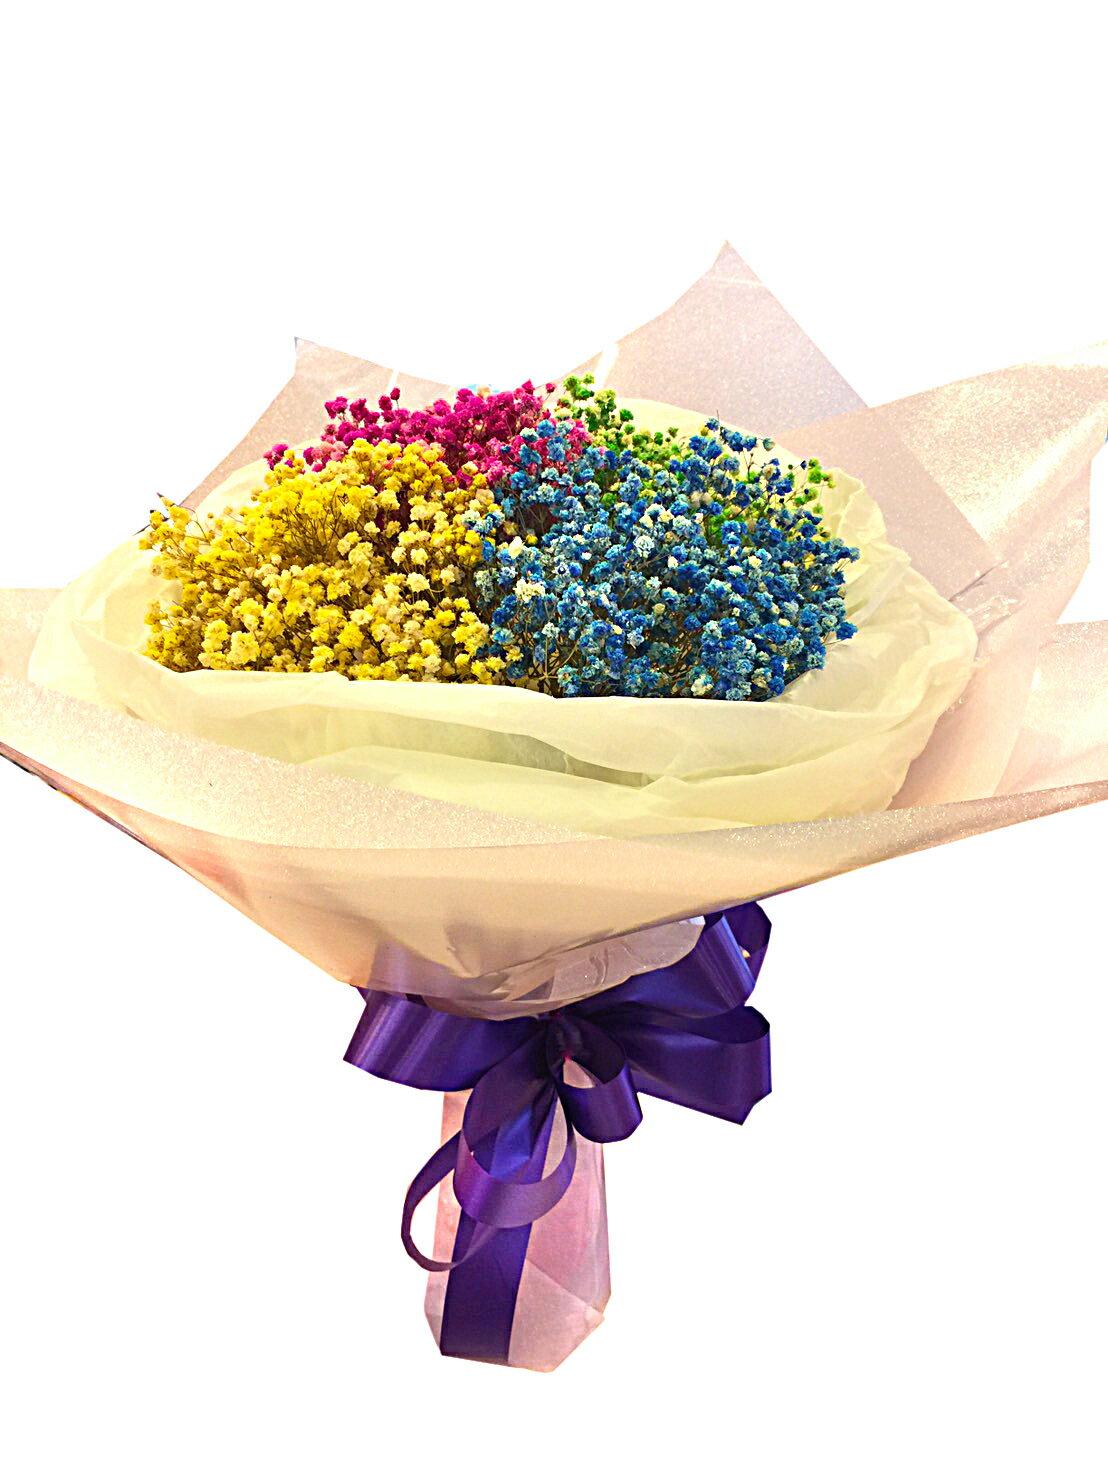 X射線【Y040022】乾燥花束,滿天星/捧花/情人節禮物/婚禮/求婚/送禮/畢業禮物/母親節